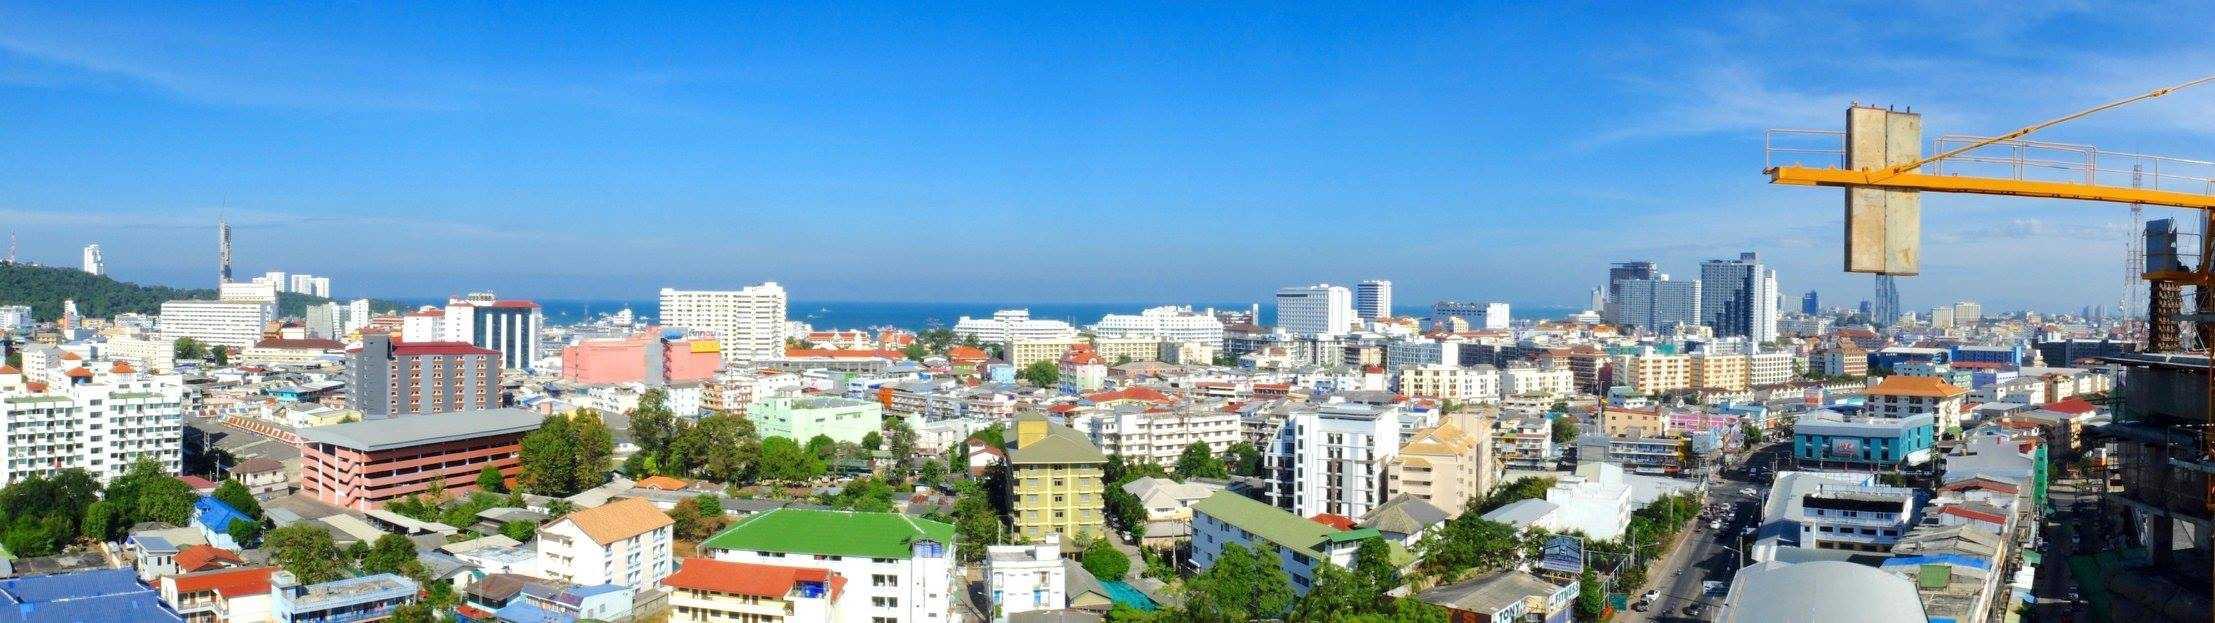 Panorama Pictures from 16th Floor - City Garden Tower Pattaya - www.citygardentower.net